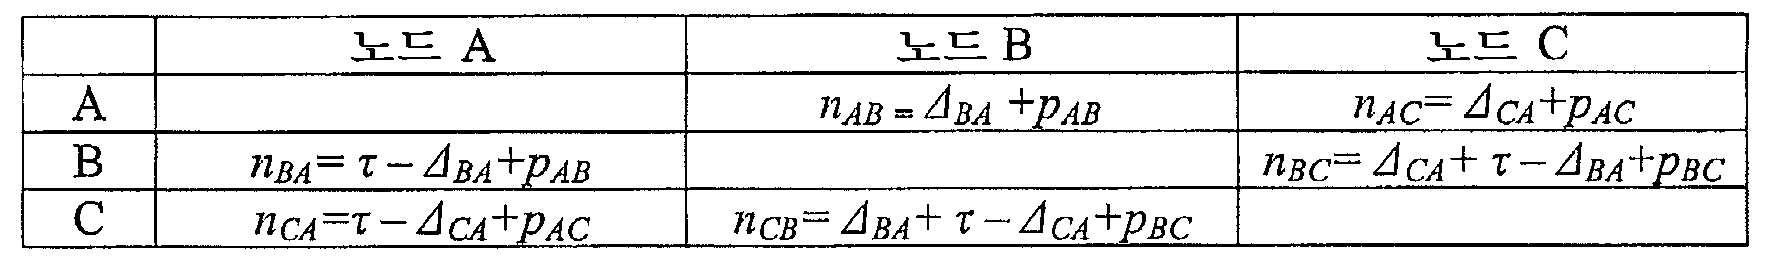 Figure 112007018196512-pct00003